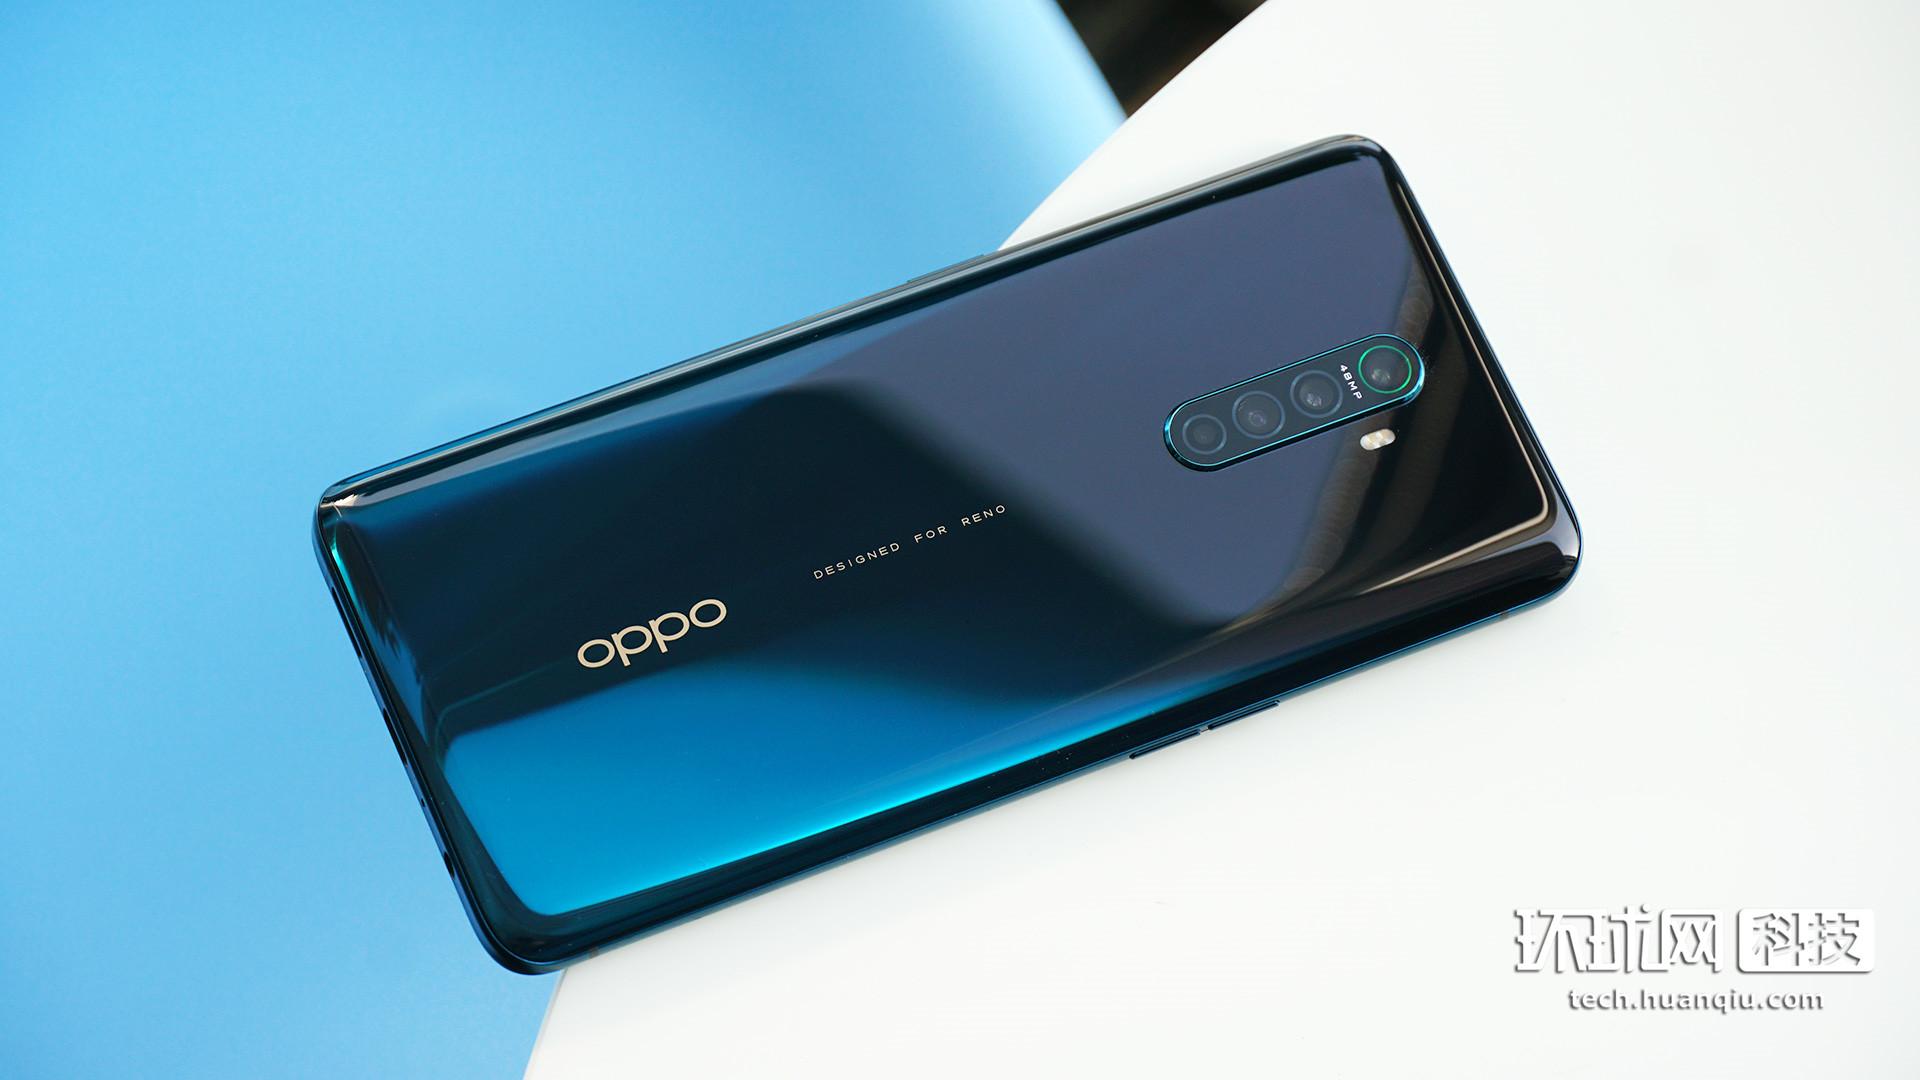 OPPORenoAce体验:软硬两招鲜的4G旗舰